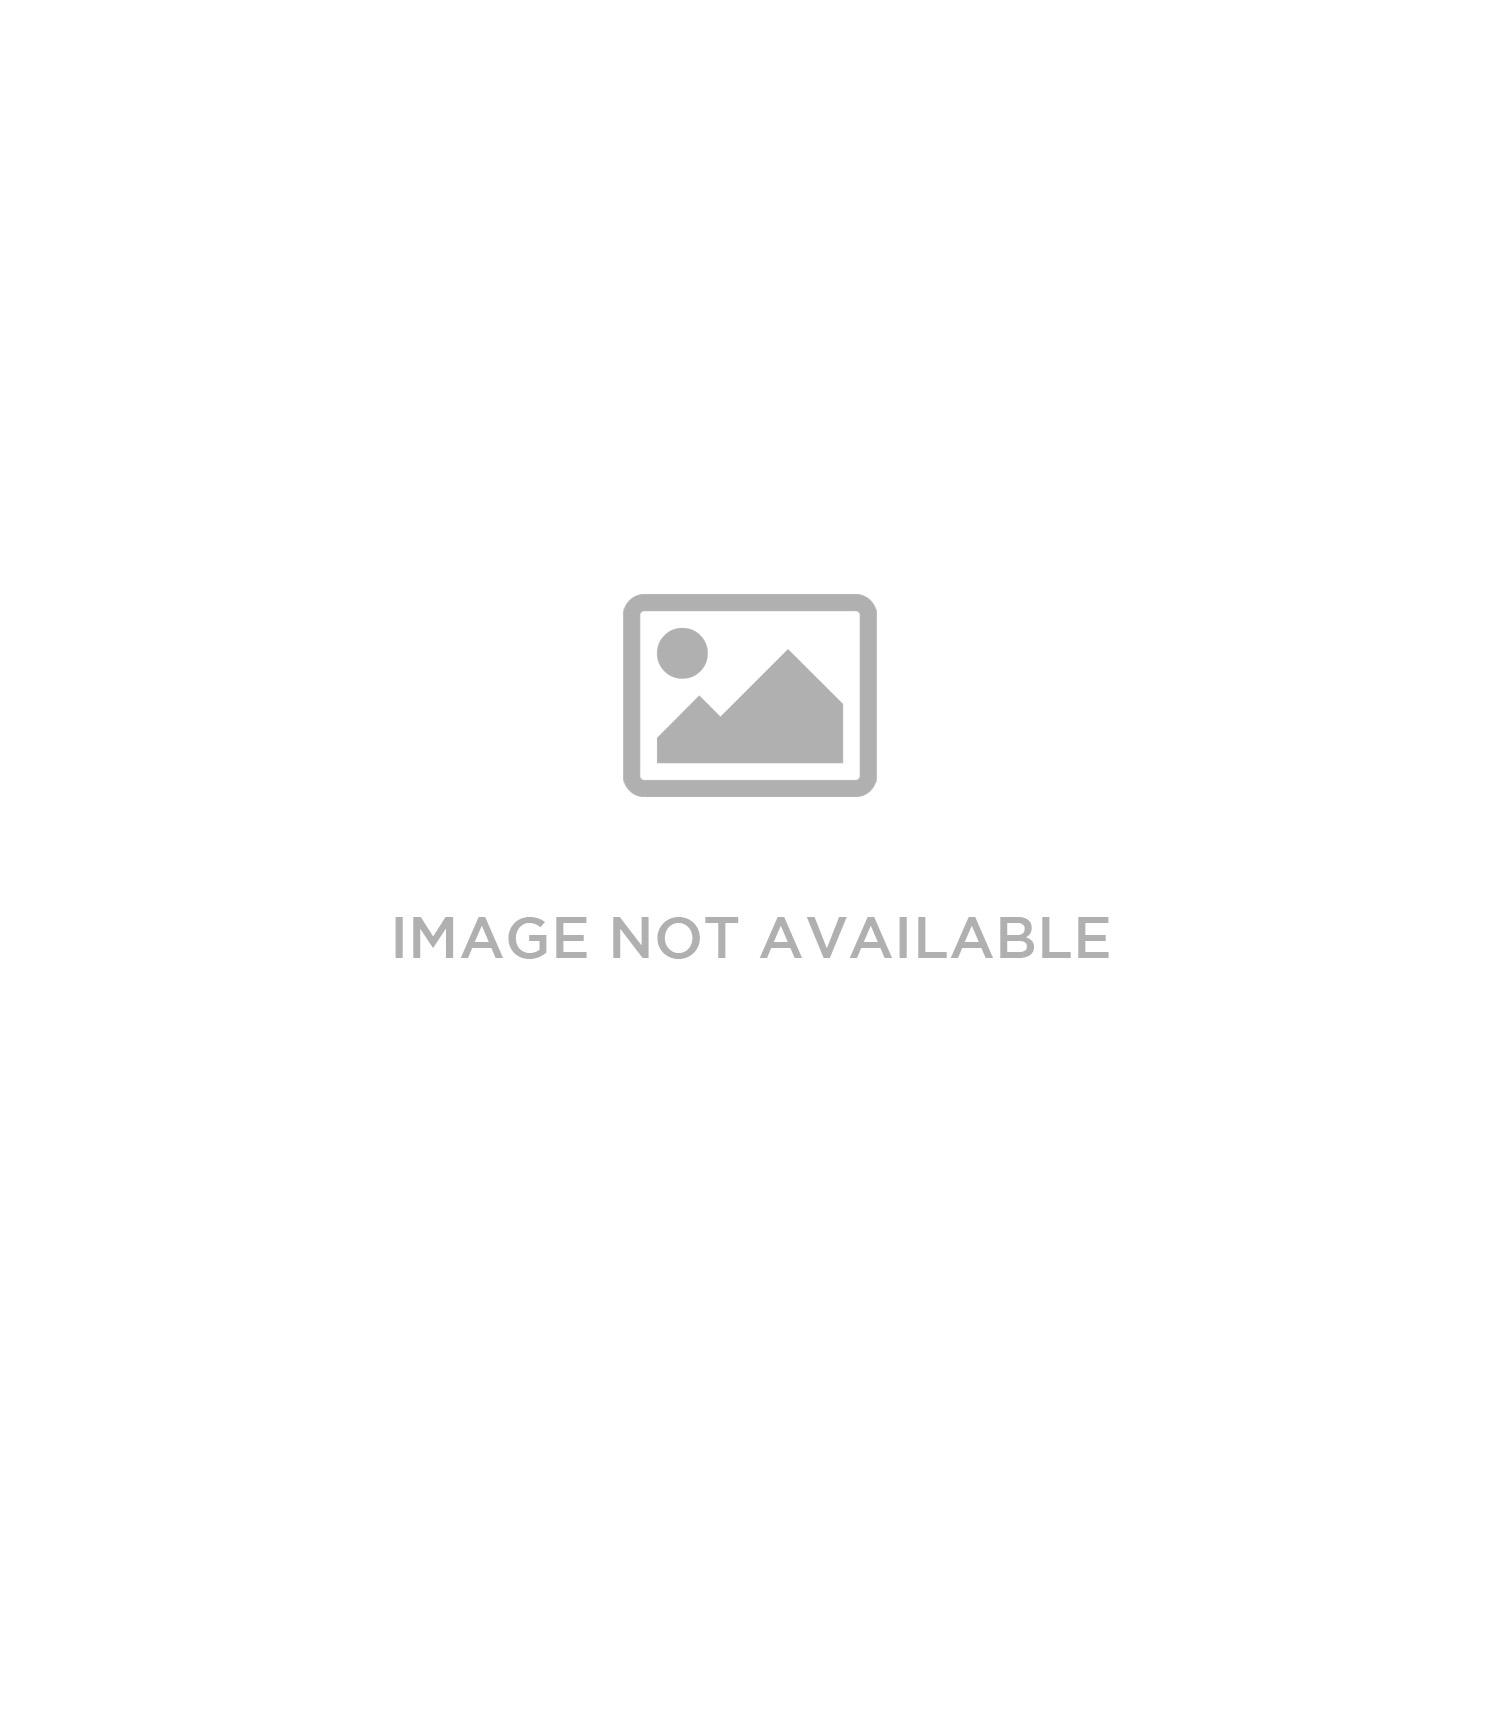 80120b80 Home; GILDAN® HEAVY COTTON™ T-SHIRT. 5000. Electric Green · Click to View  Image ...